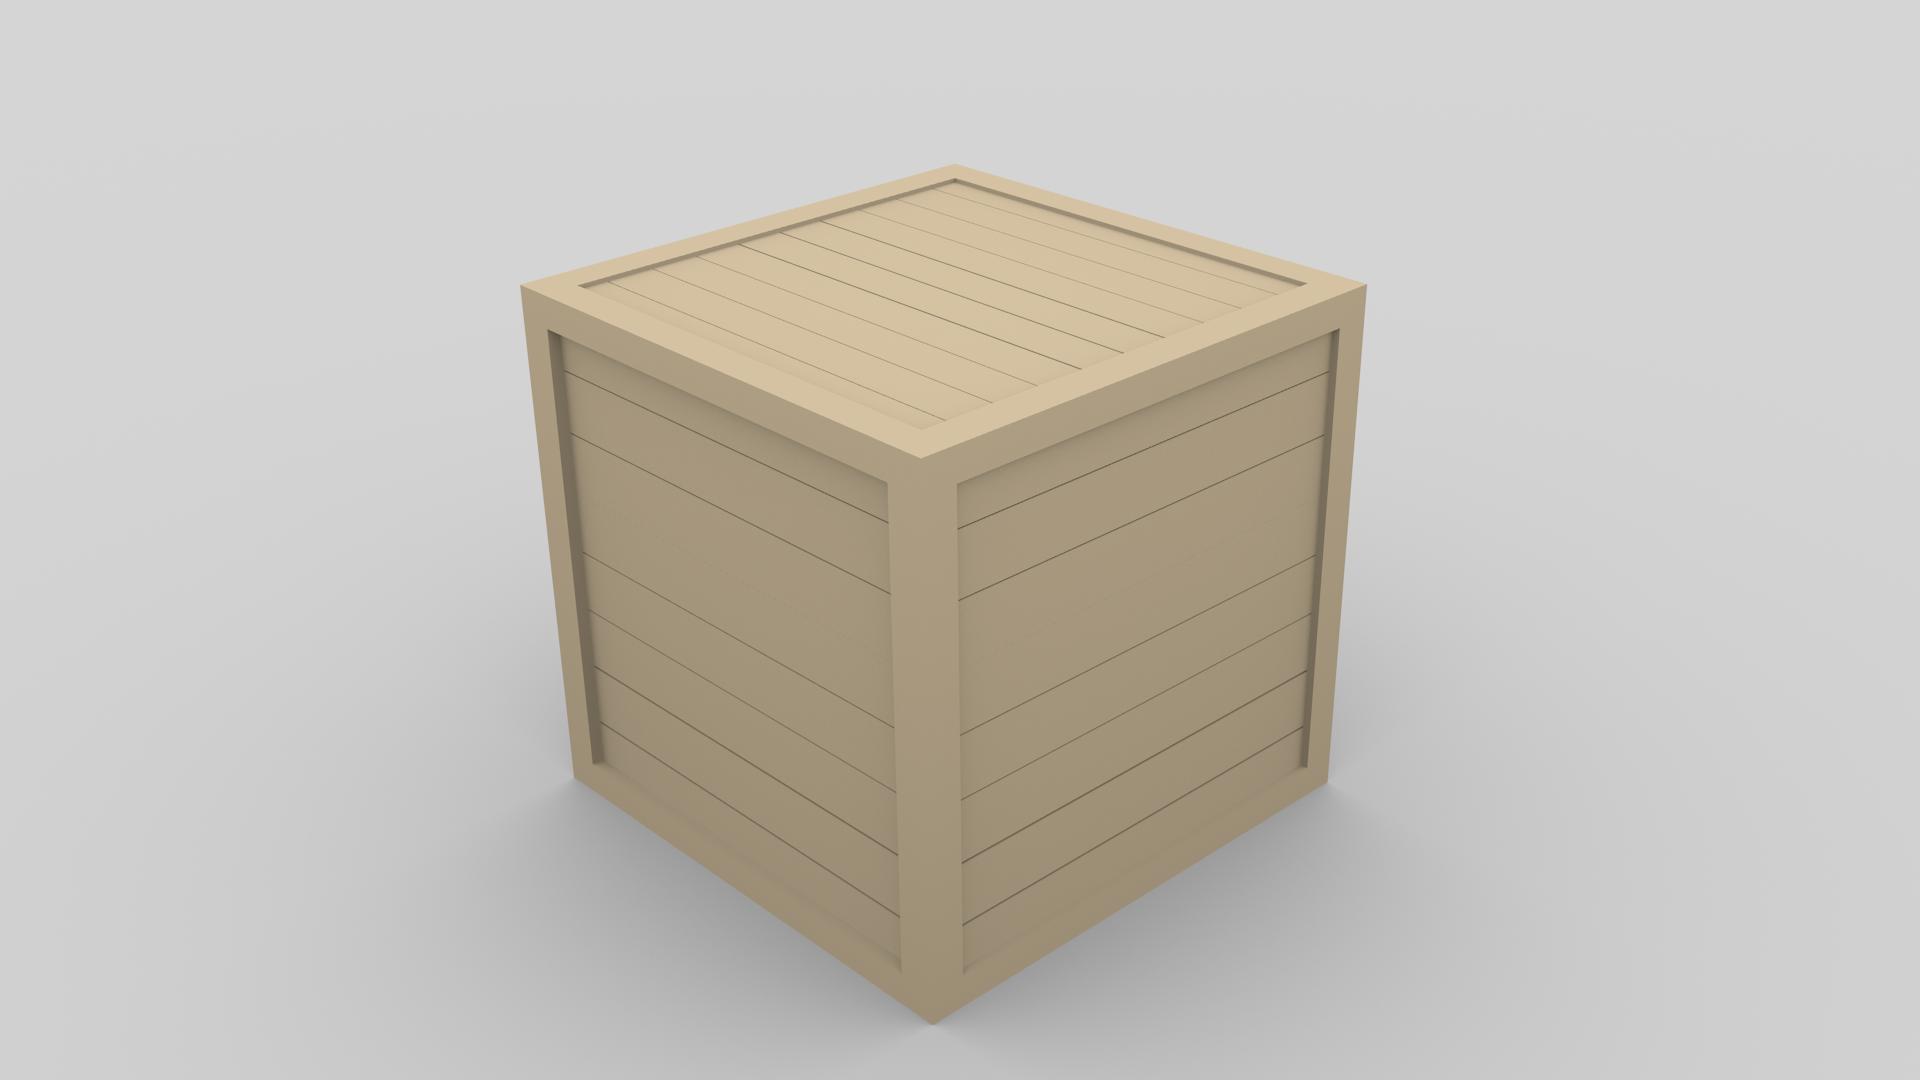 render_crate_01.png